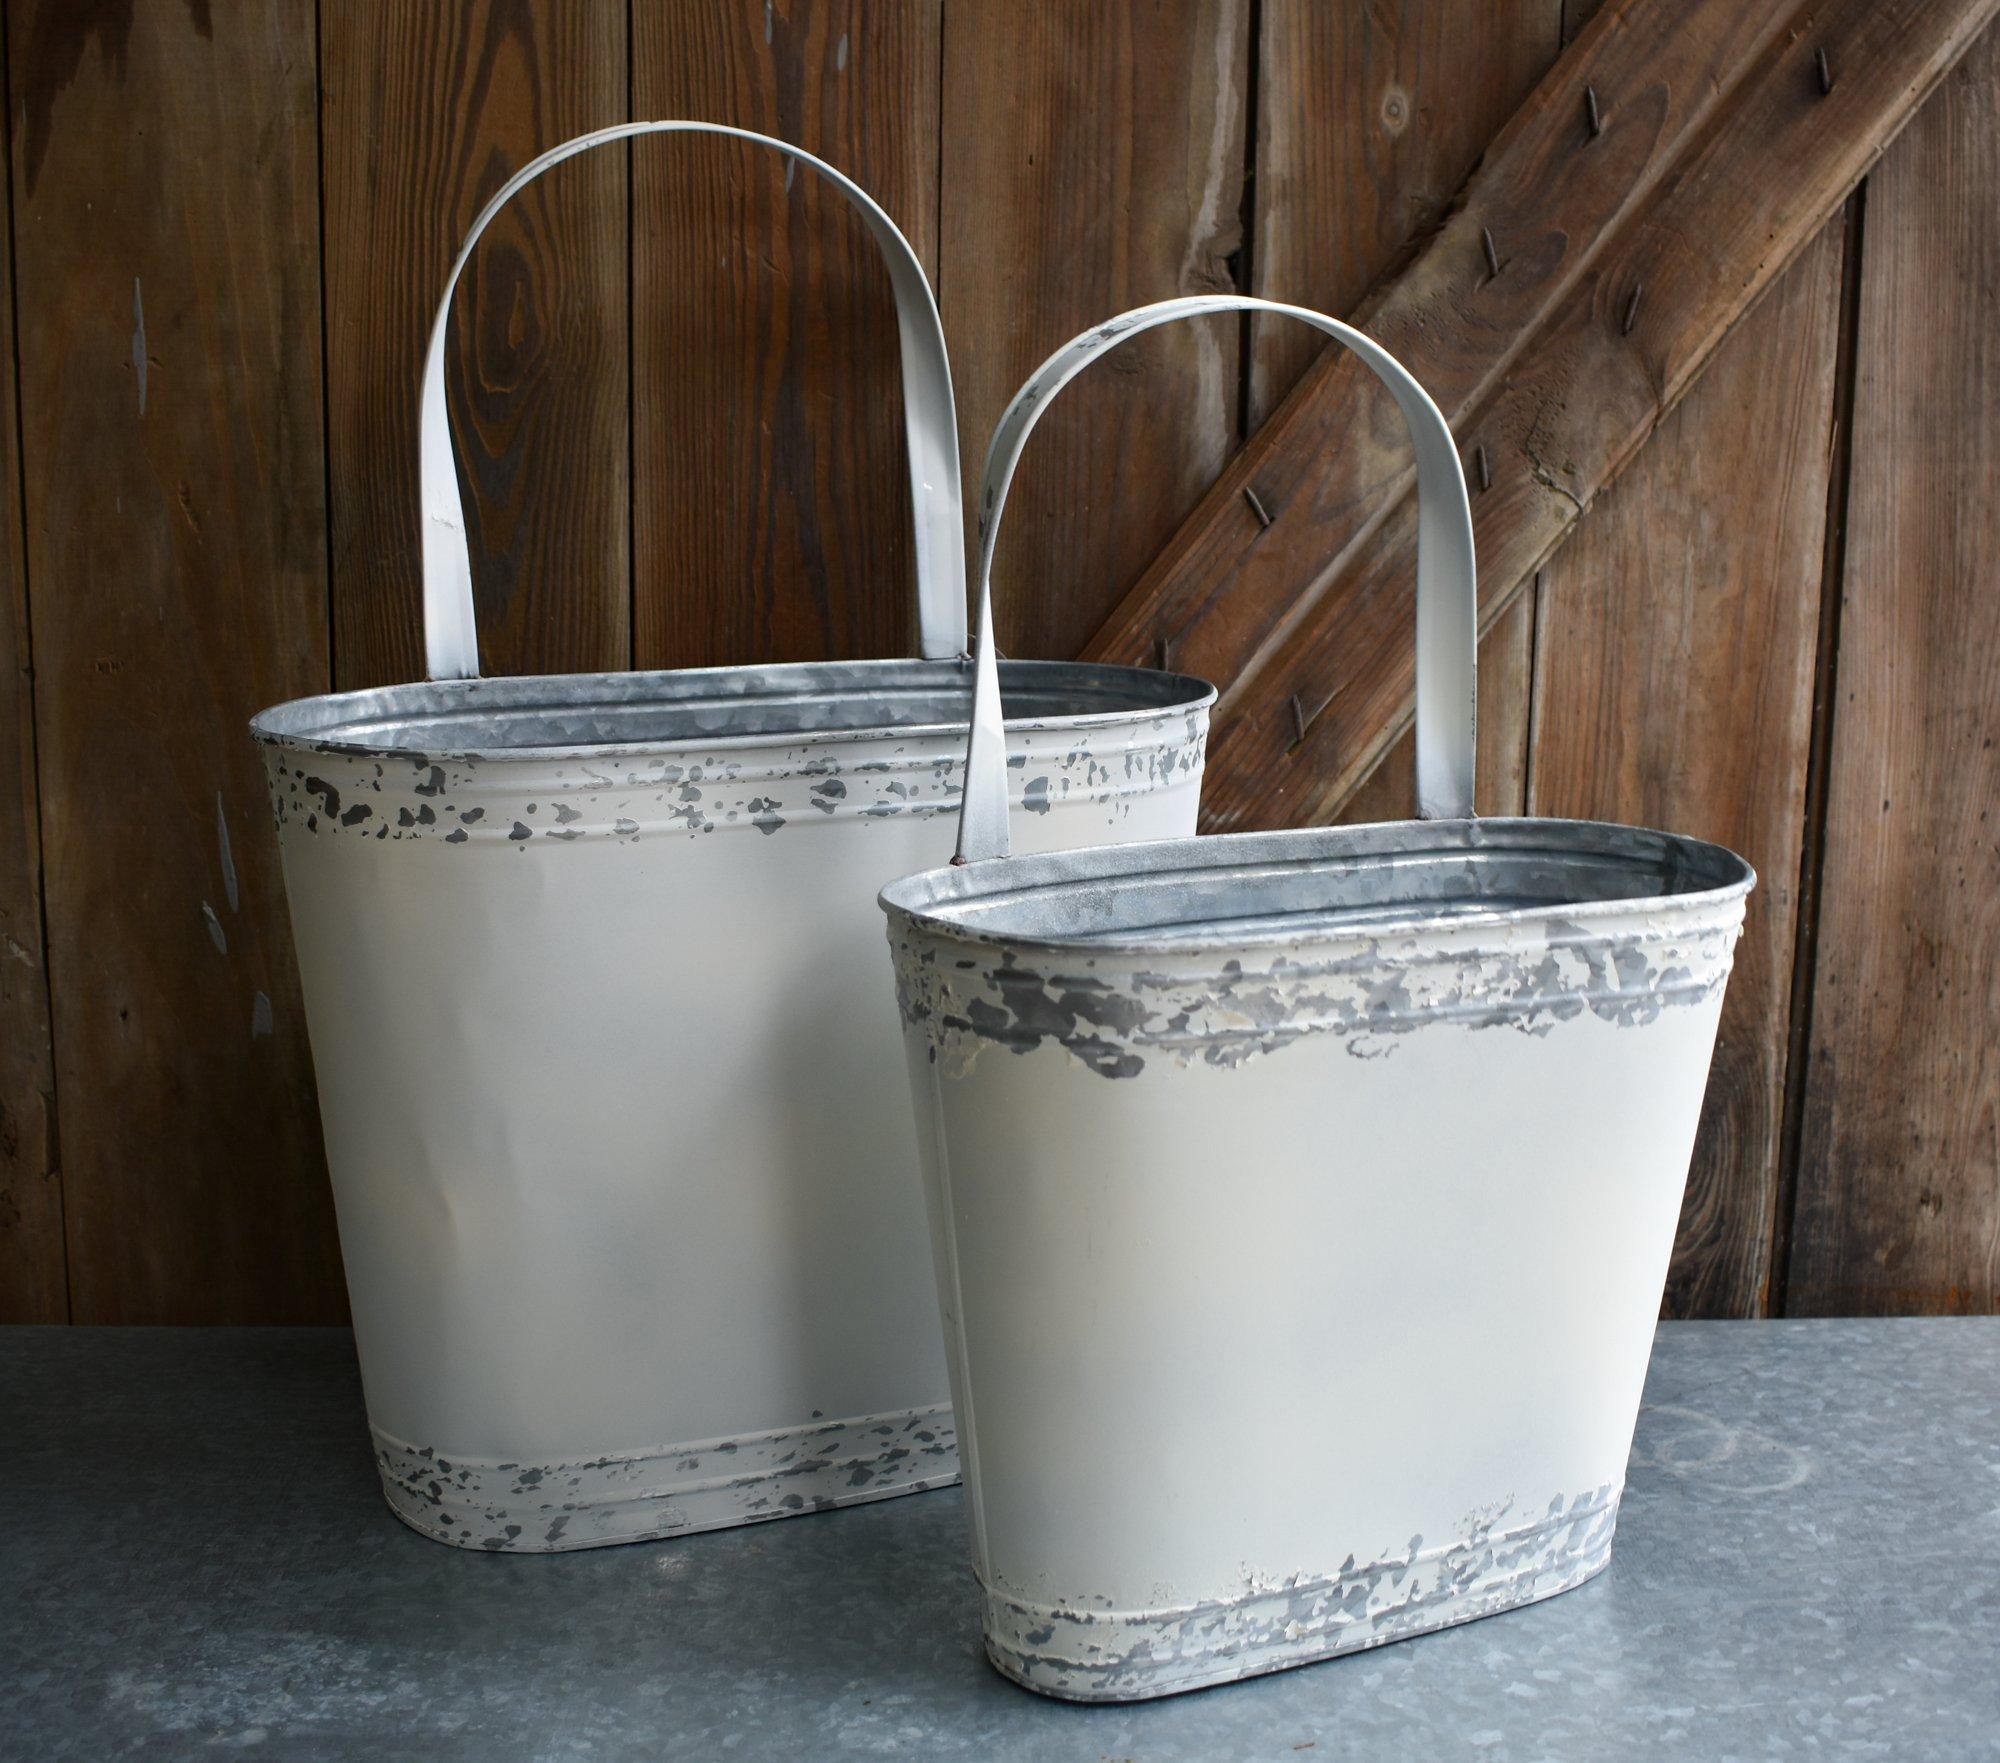 Galvanized Wall Bucket Set of 2 15''x21'', 12.5''x18''